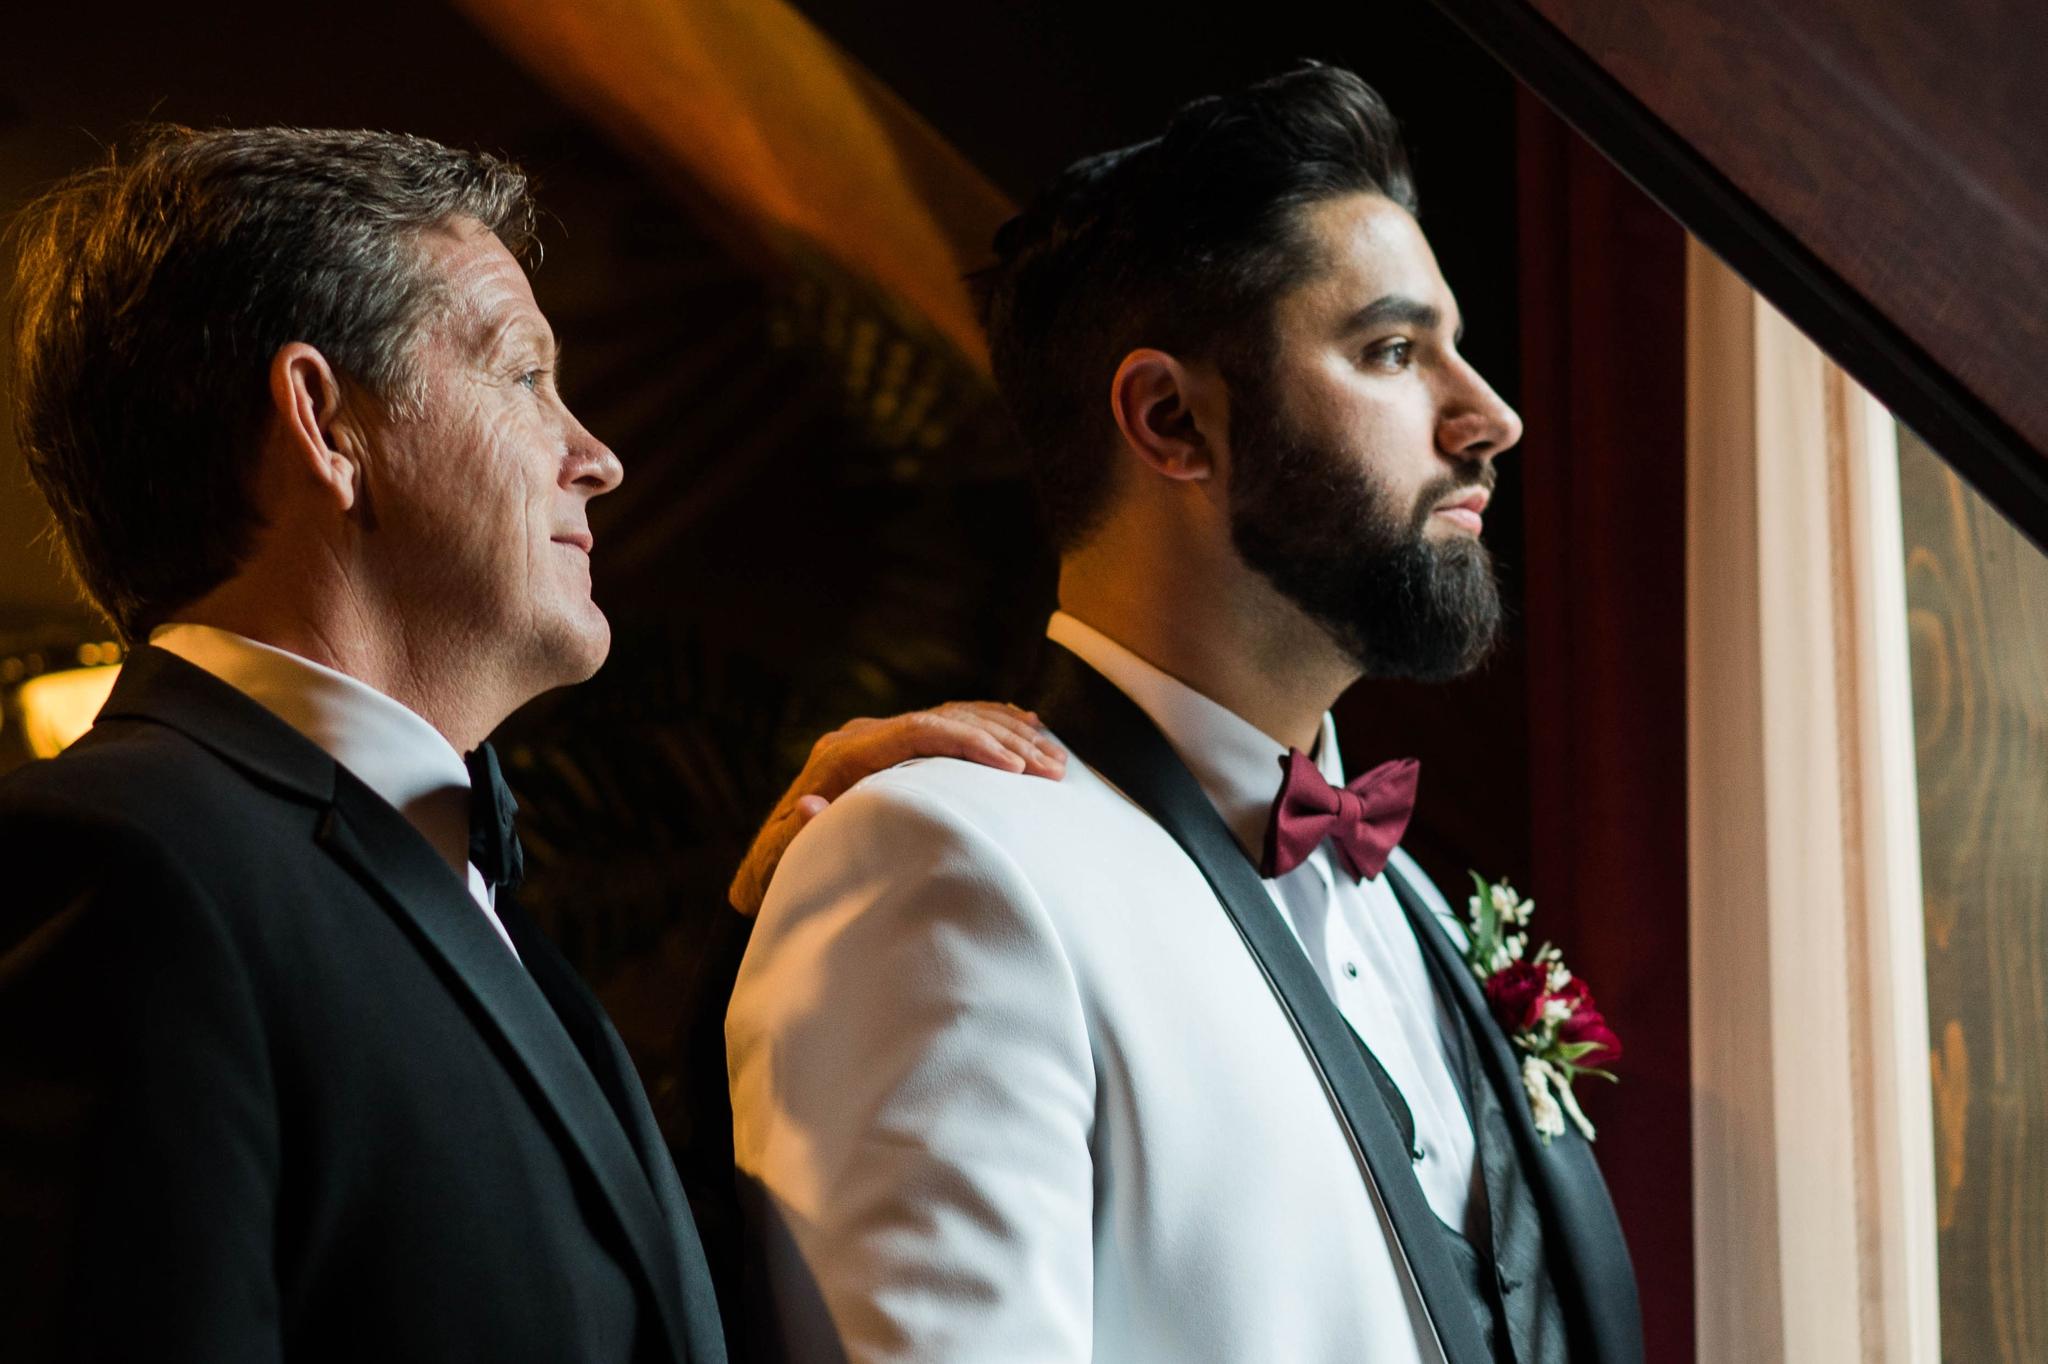 groom with his father in law portrait - Honolulu Oahu Hawaii Wedding Photographer